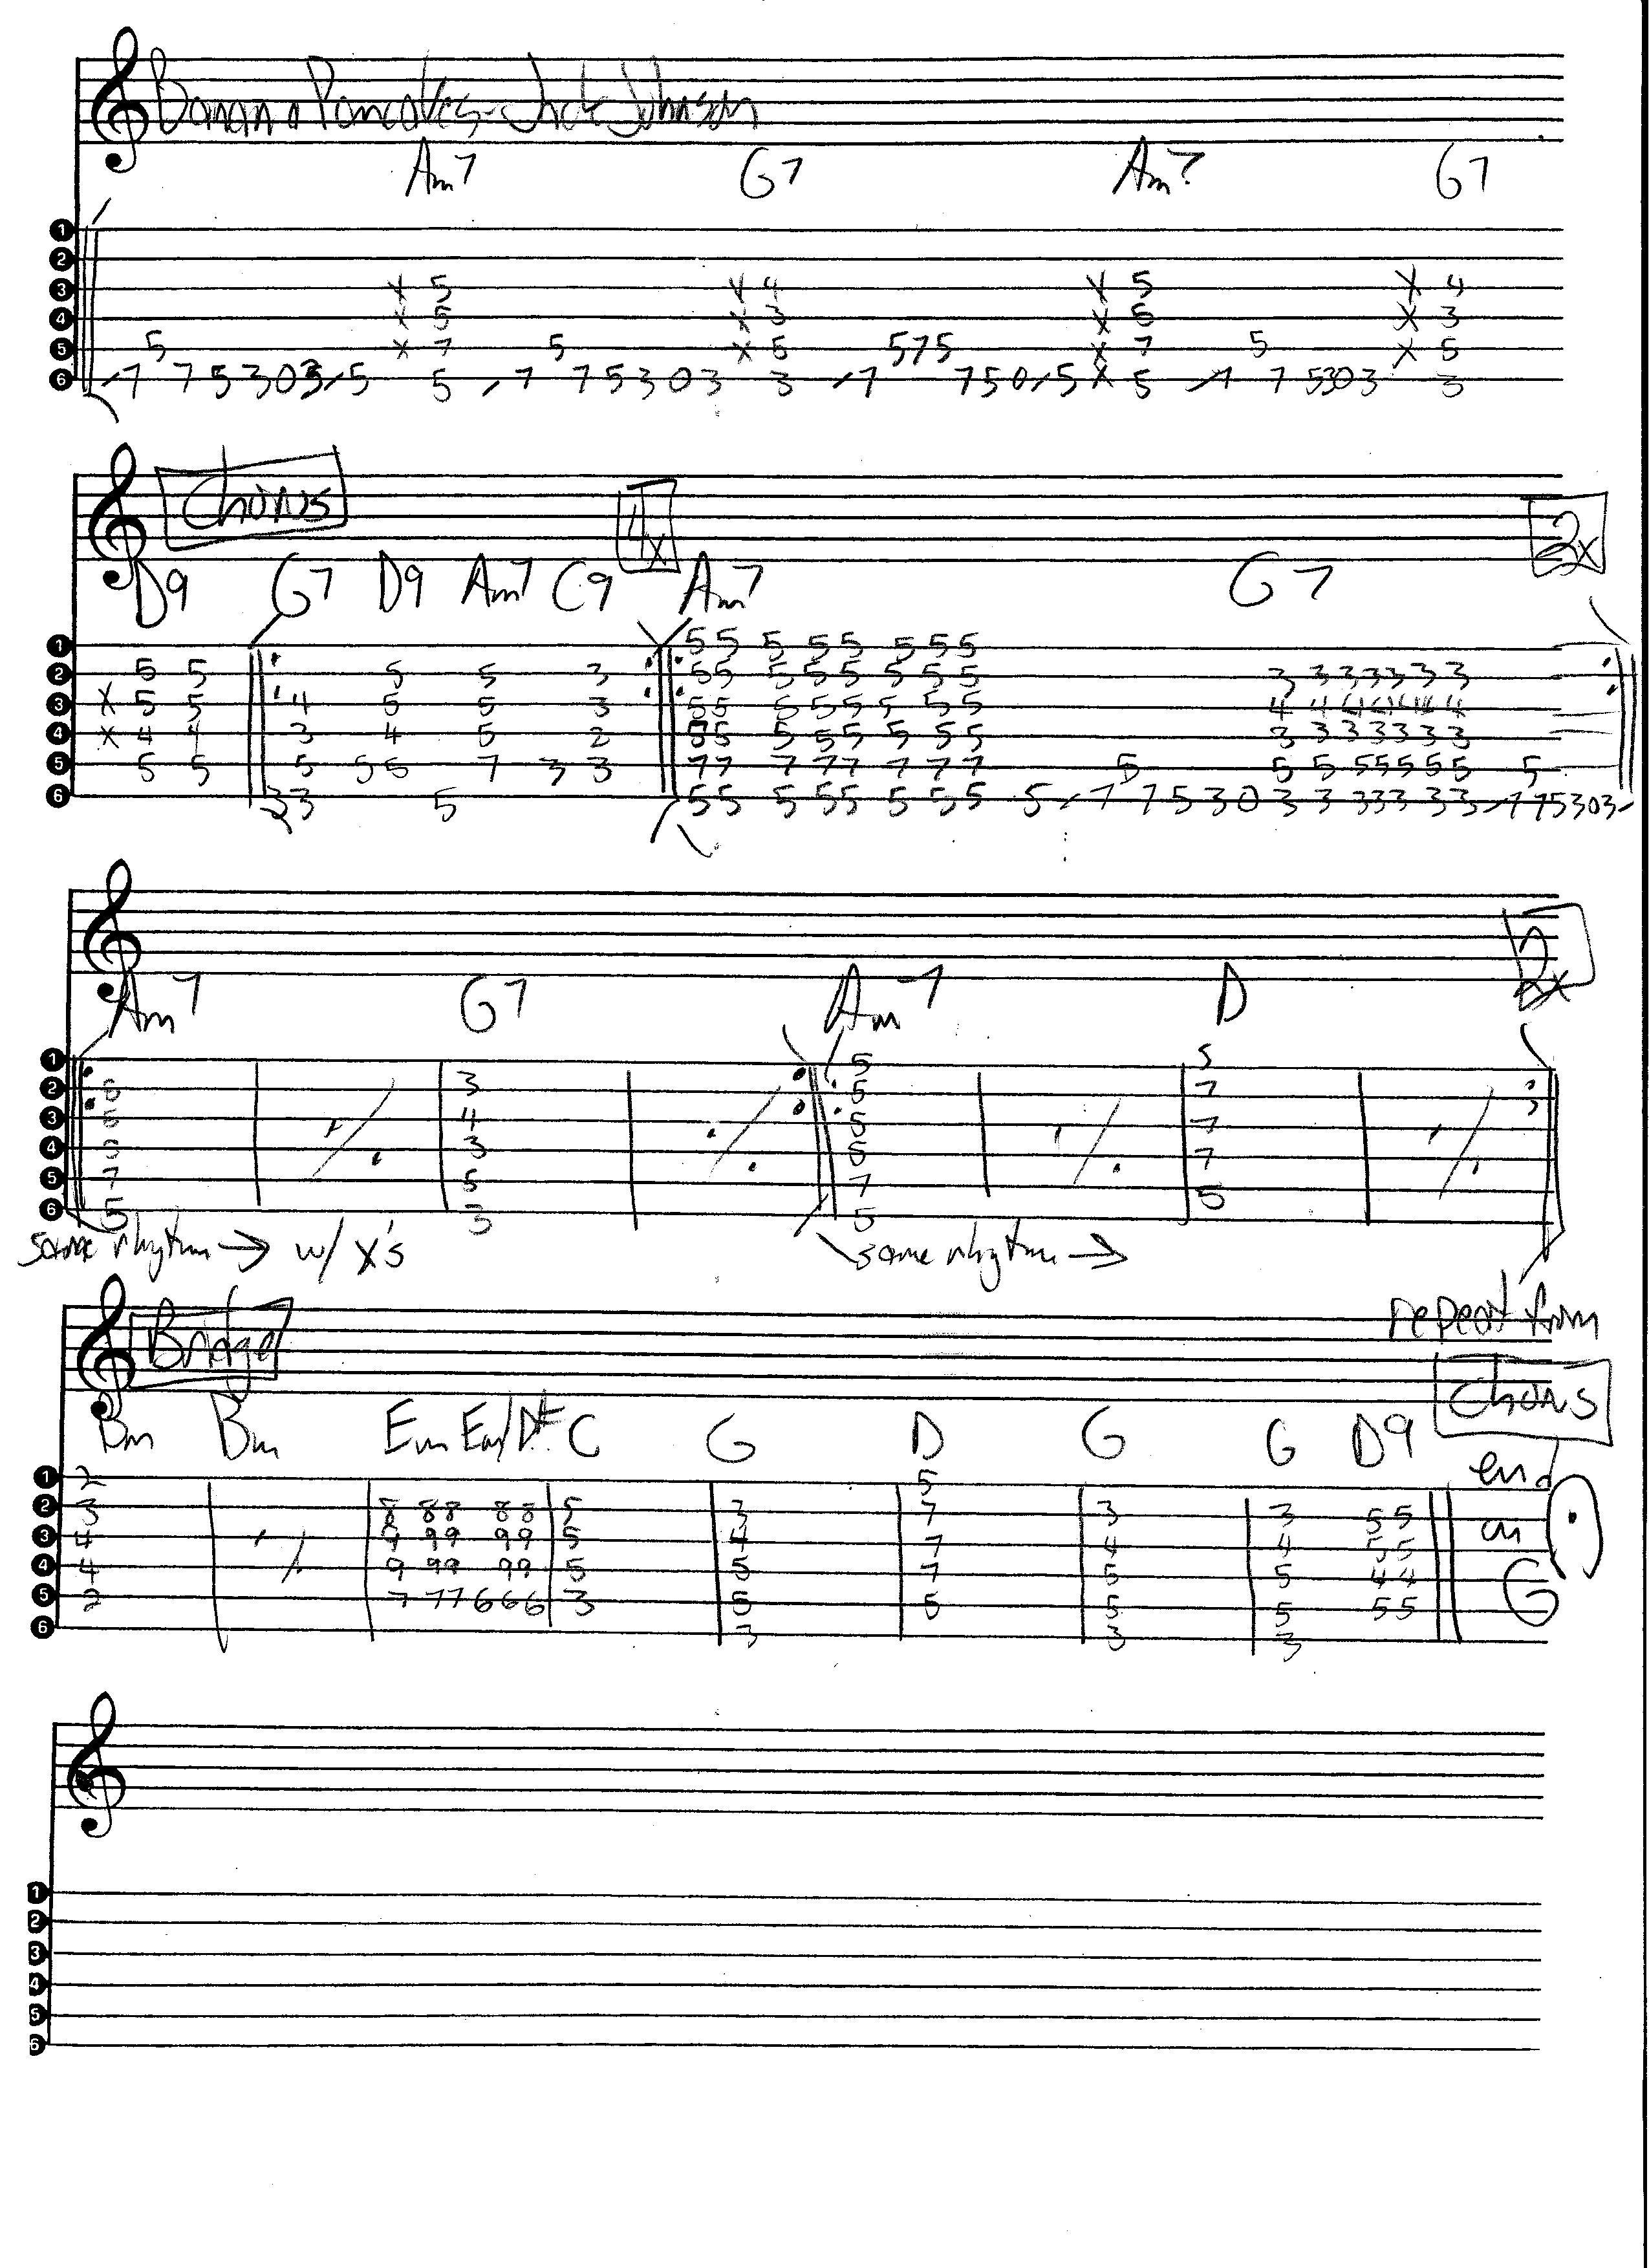 Banana Pancakes Ukulele Chords  John Mellencamp Authority Song Guitar Tabs bloomsutti mp3